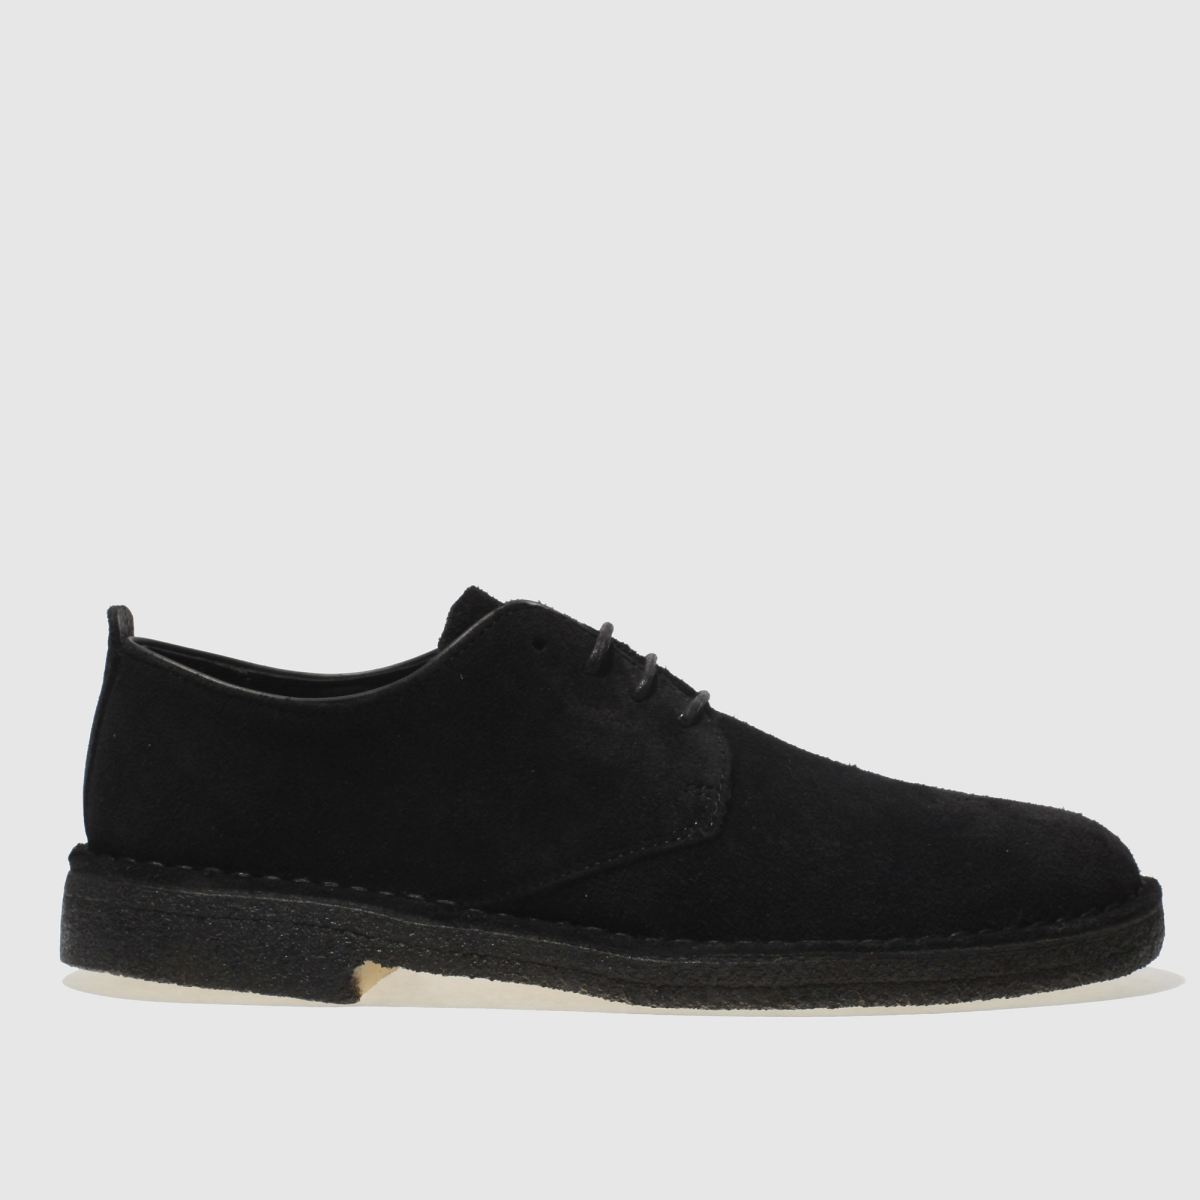 Clarks Originals Black Desert London Shoes